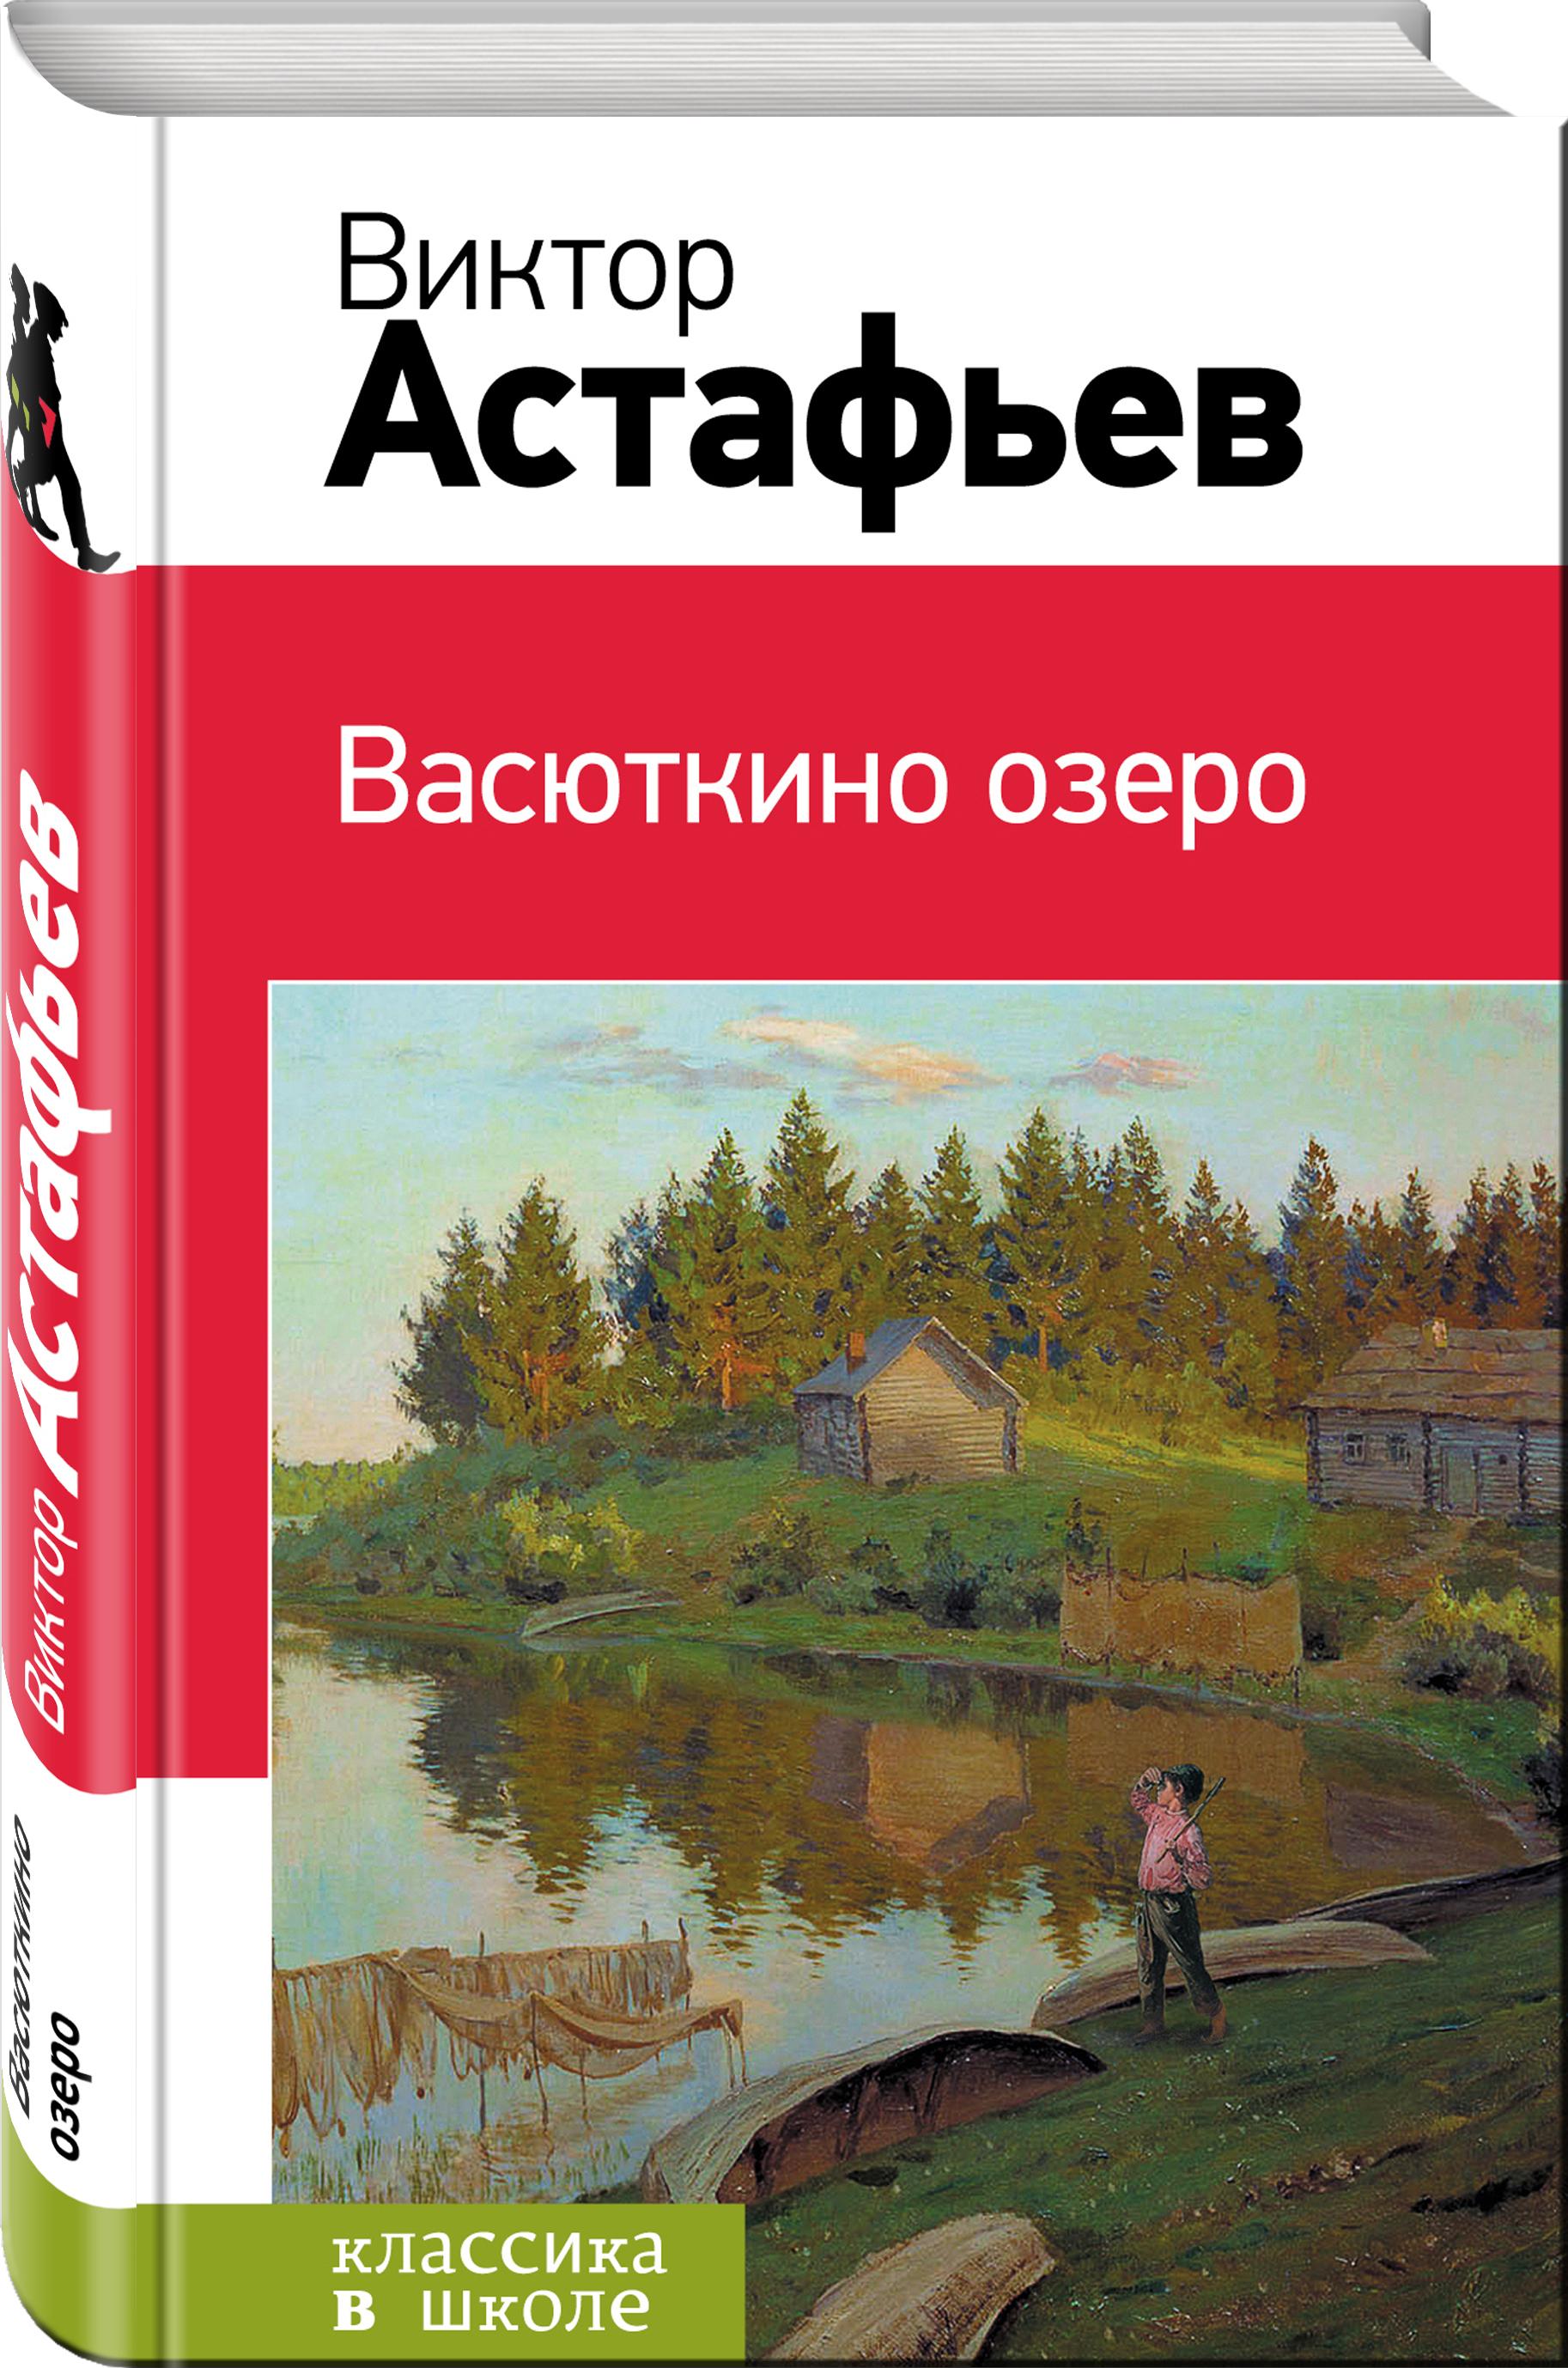 Виктор Астафьев Васюткино озеро виктор астафьев кавказец